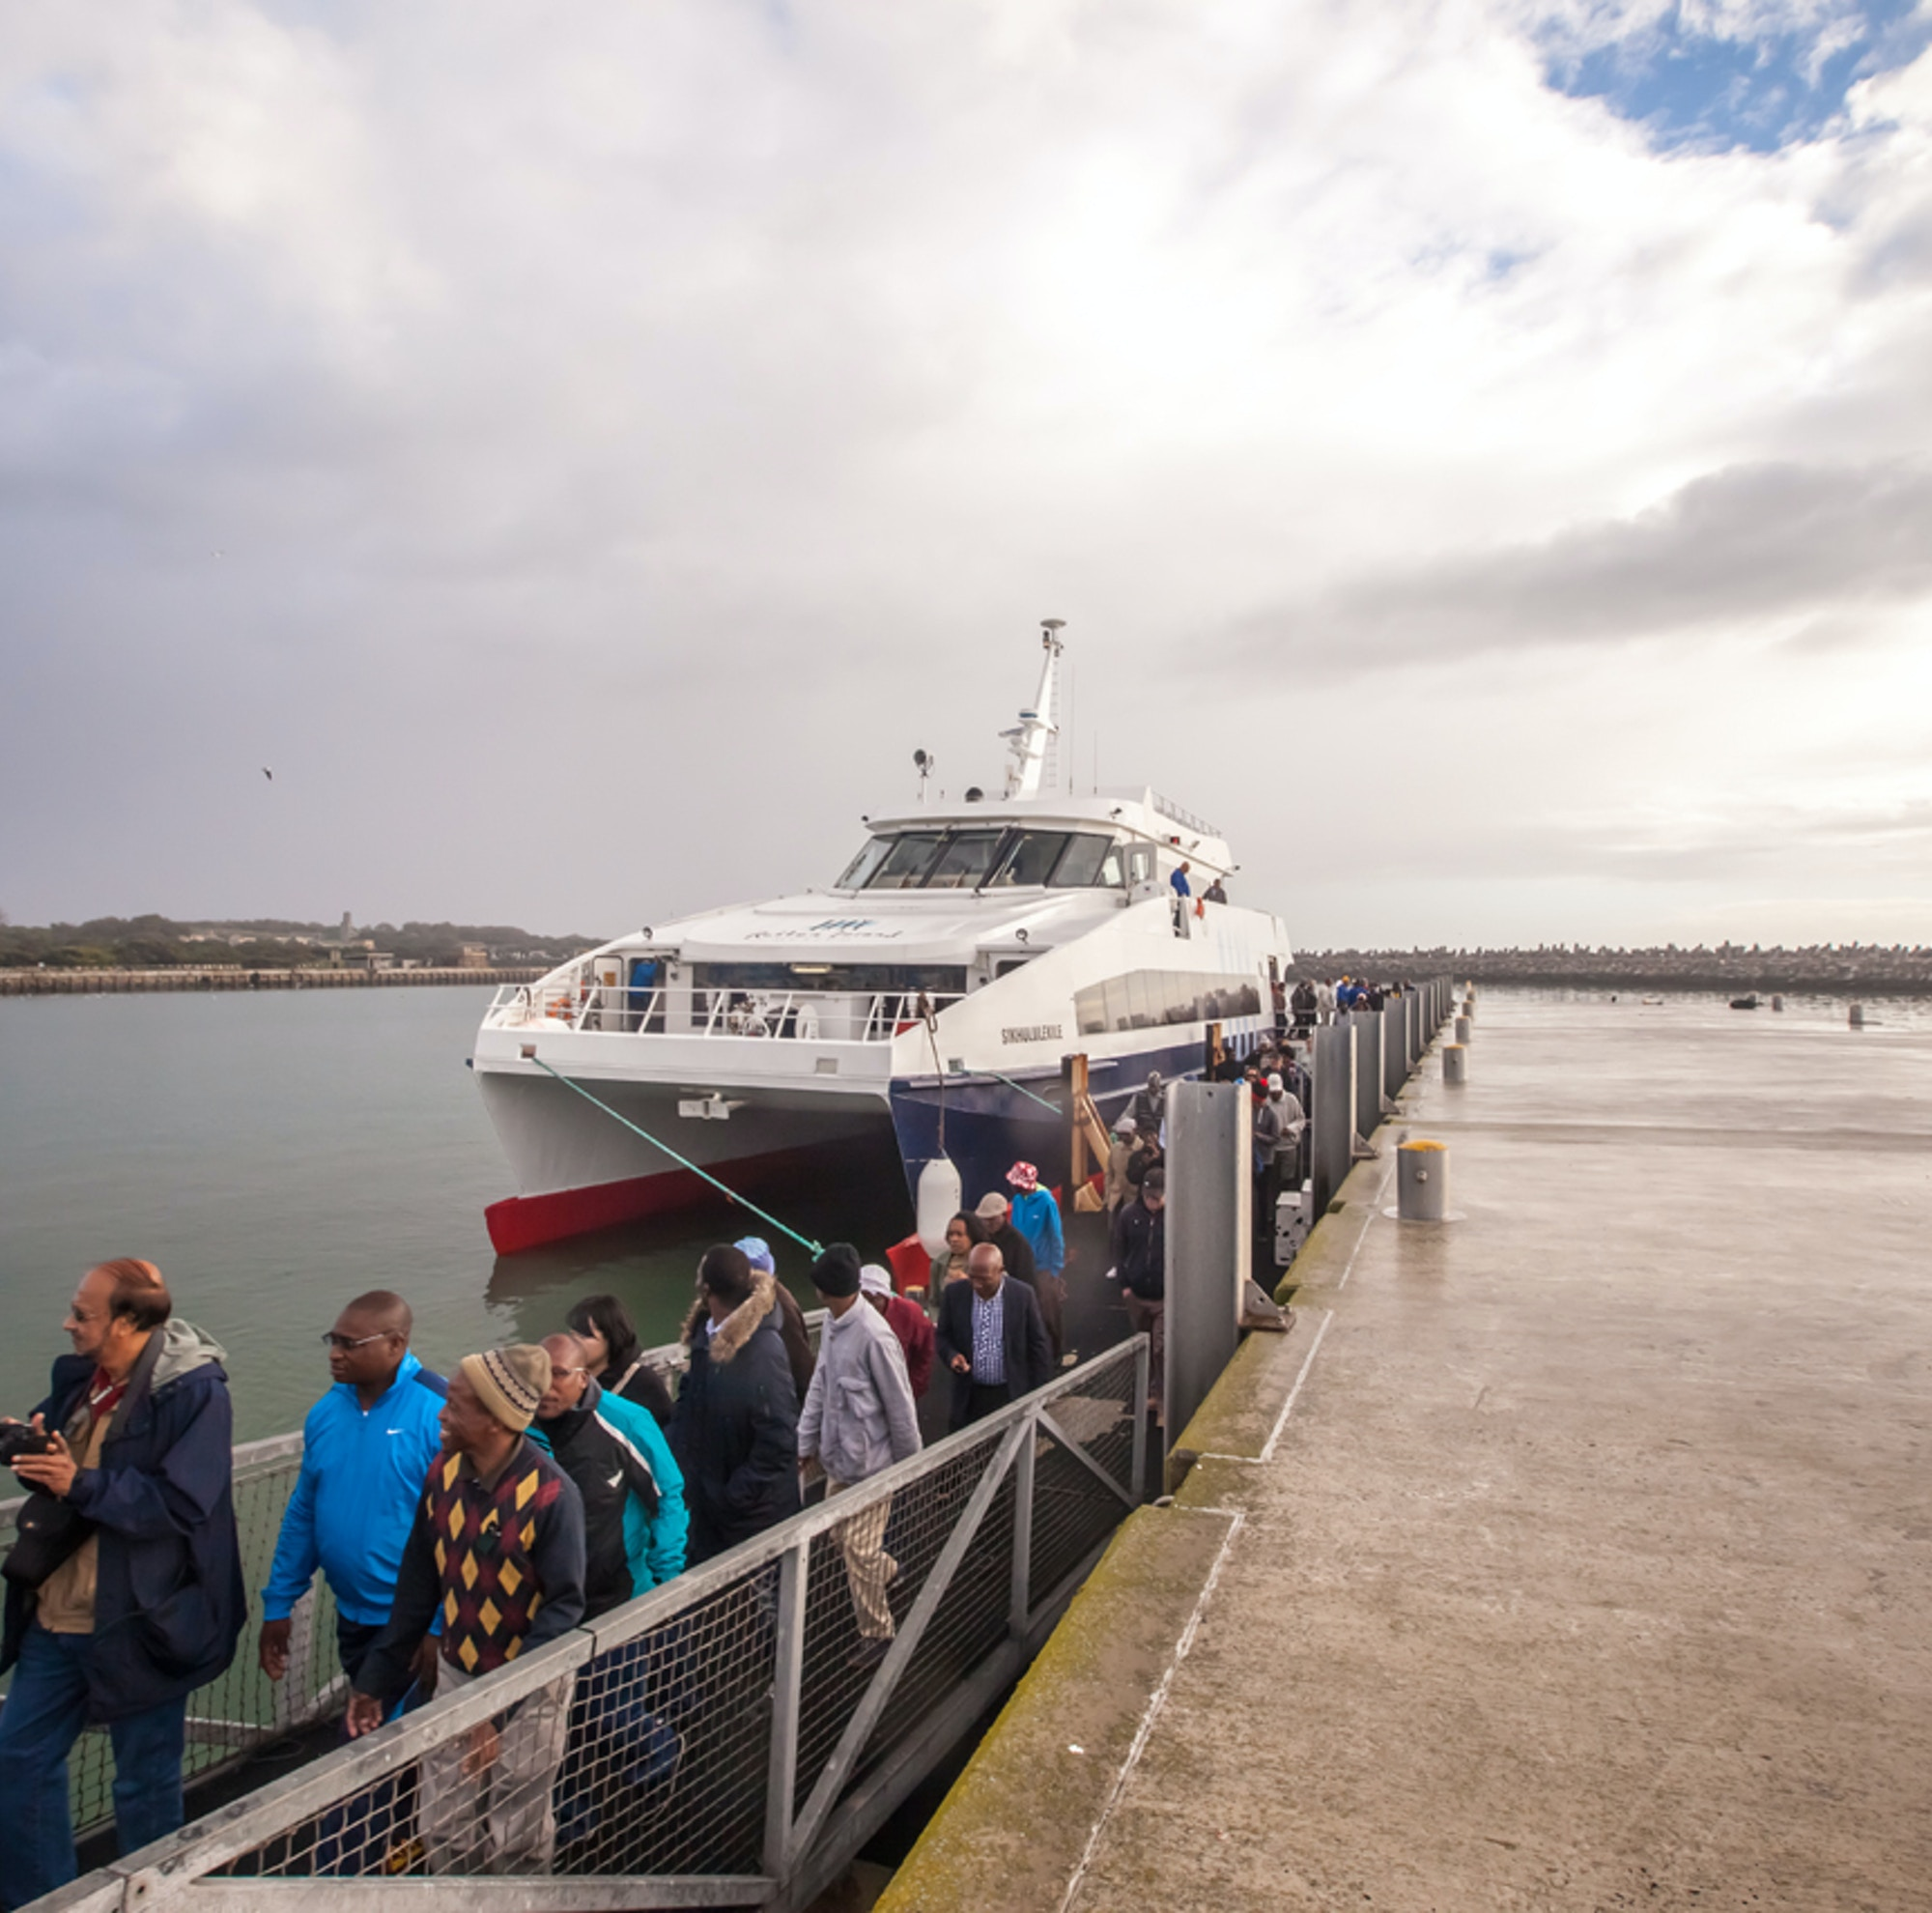 Disembarking at Robben Island